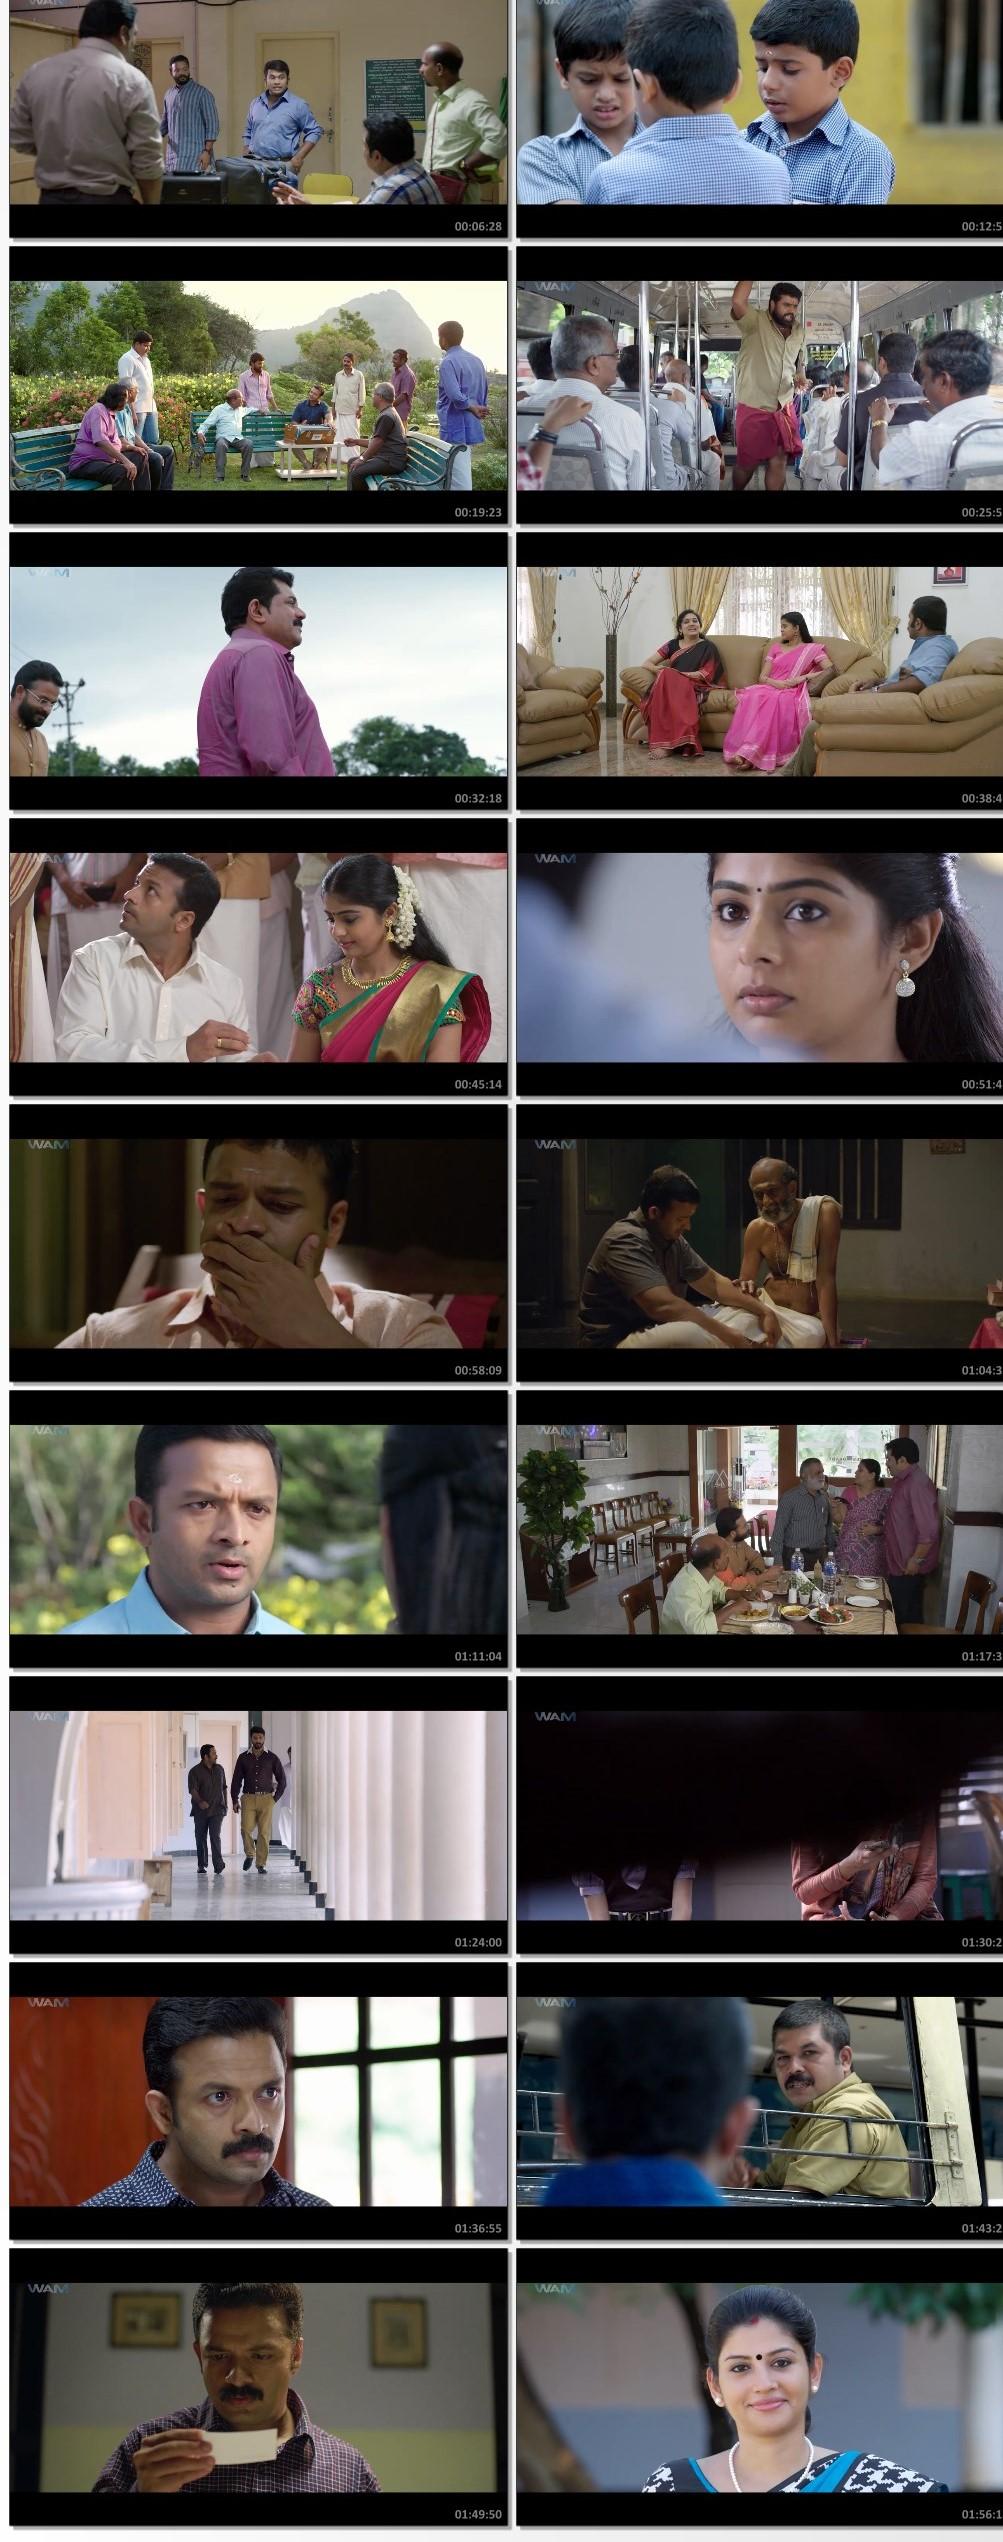 Su-Su-Sudhir-2021-Hindi-Dubbed-710p-mp4-thumbs